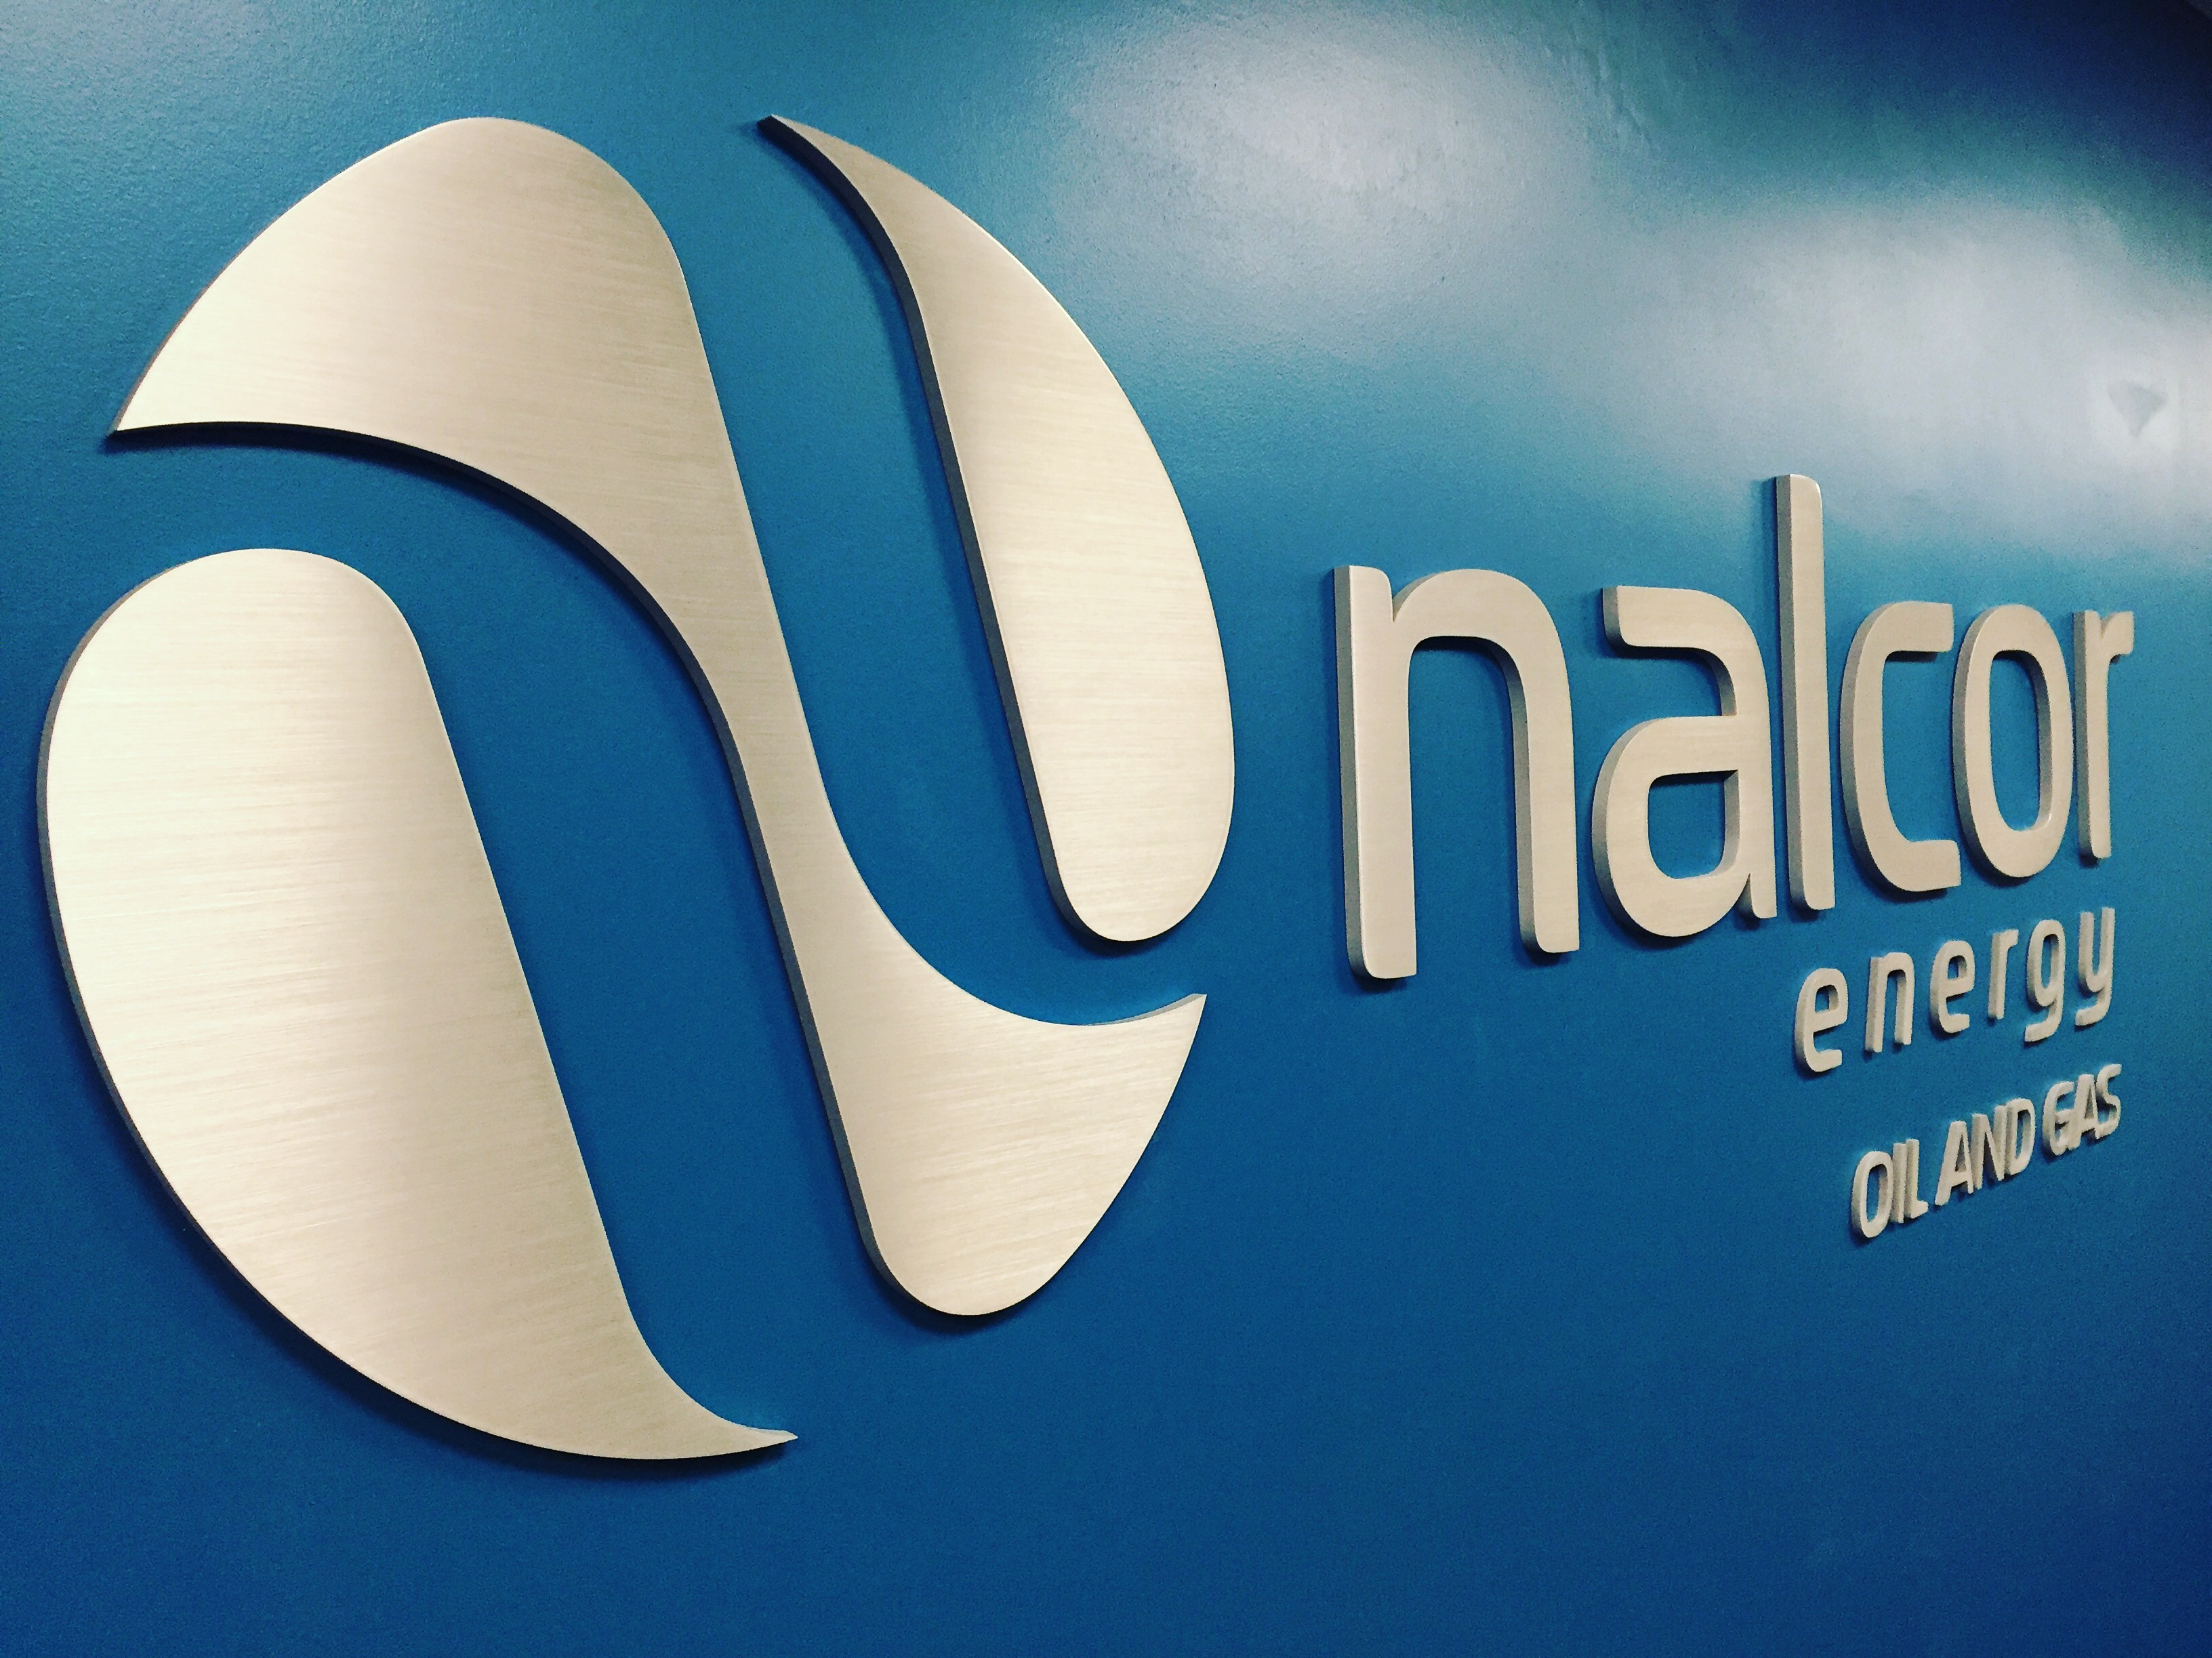 Nalcor shape cut letters